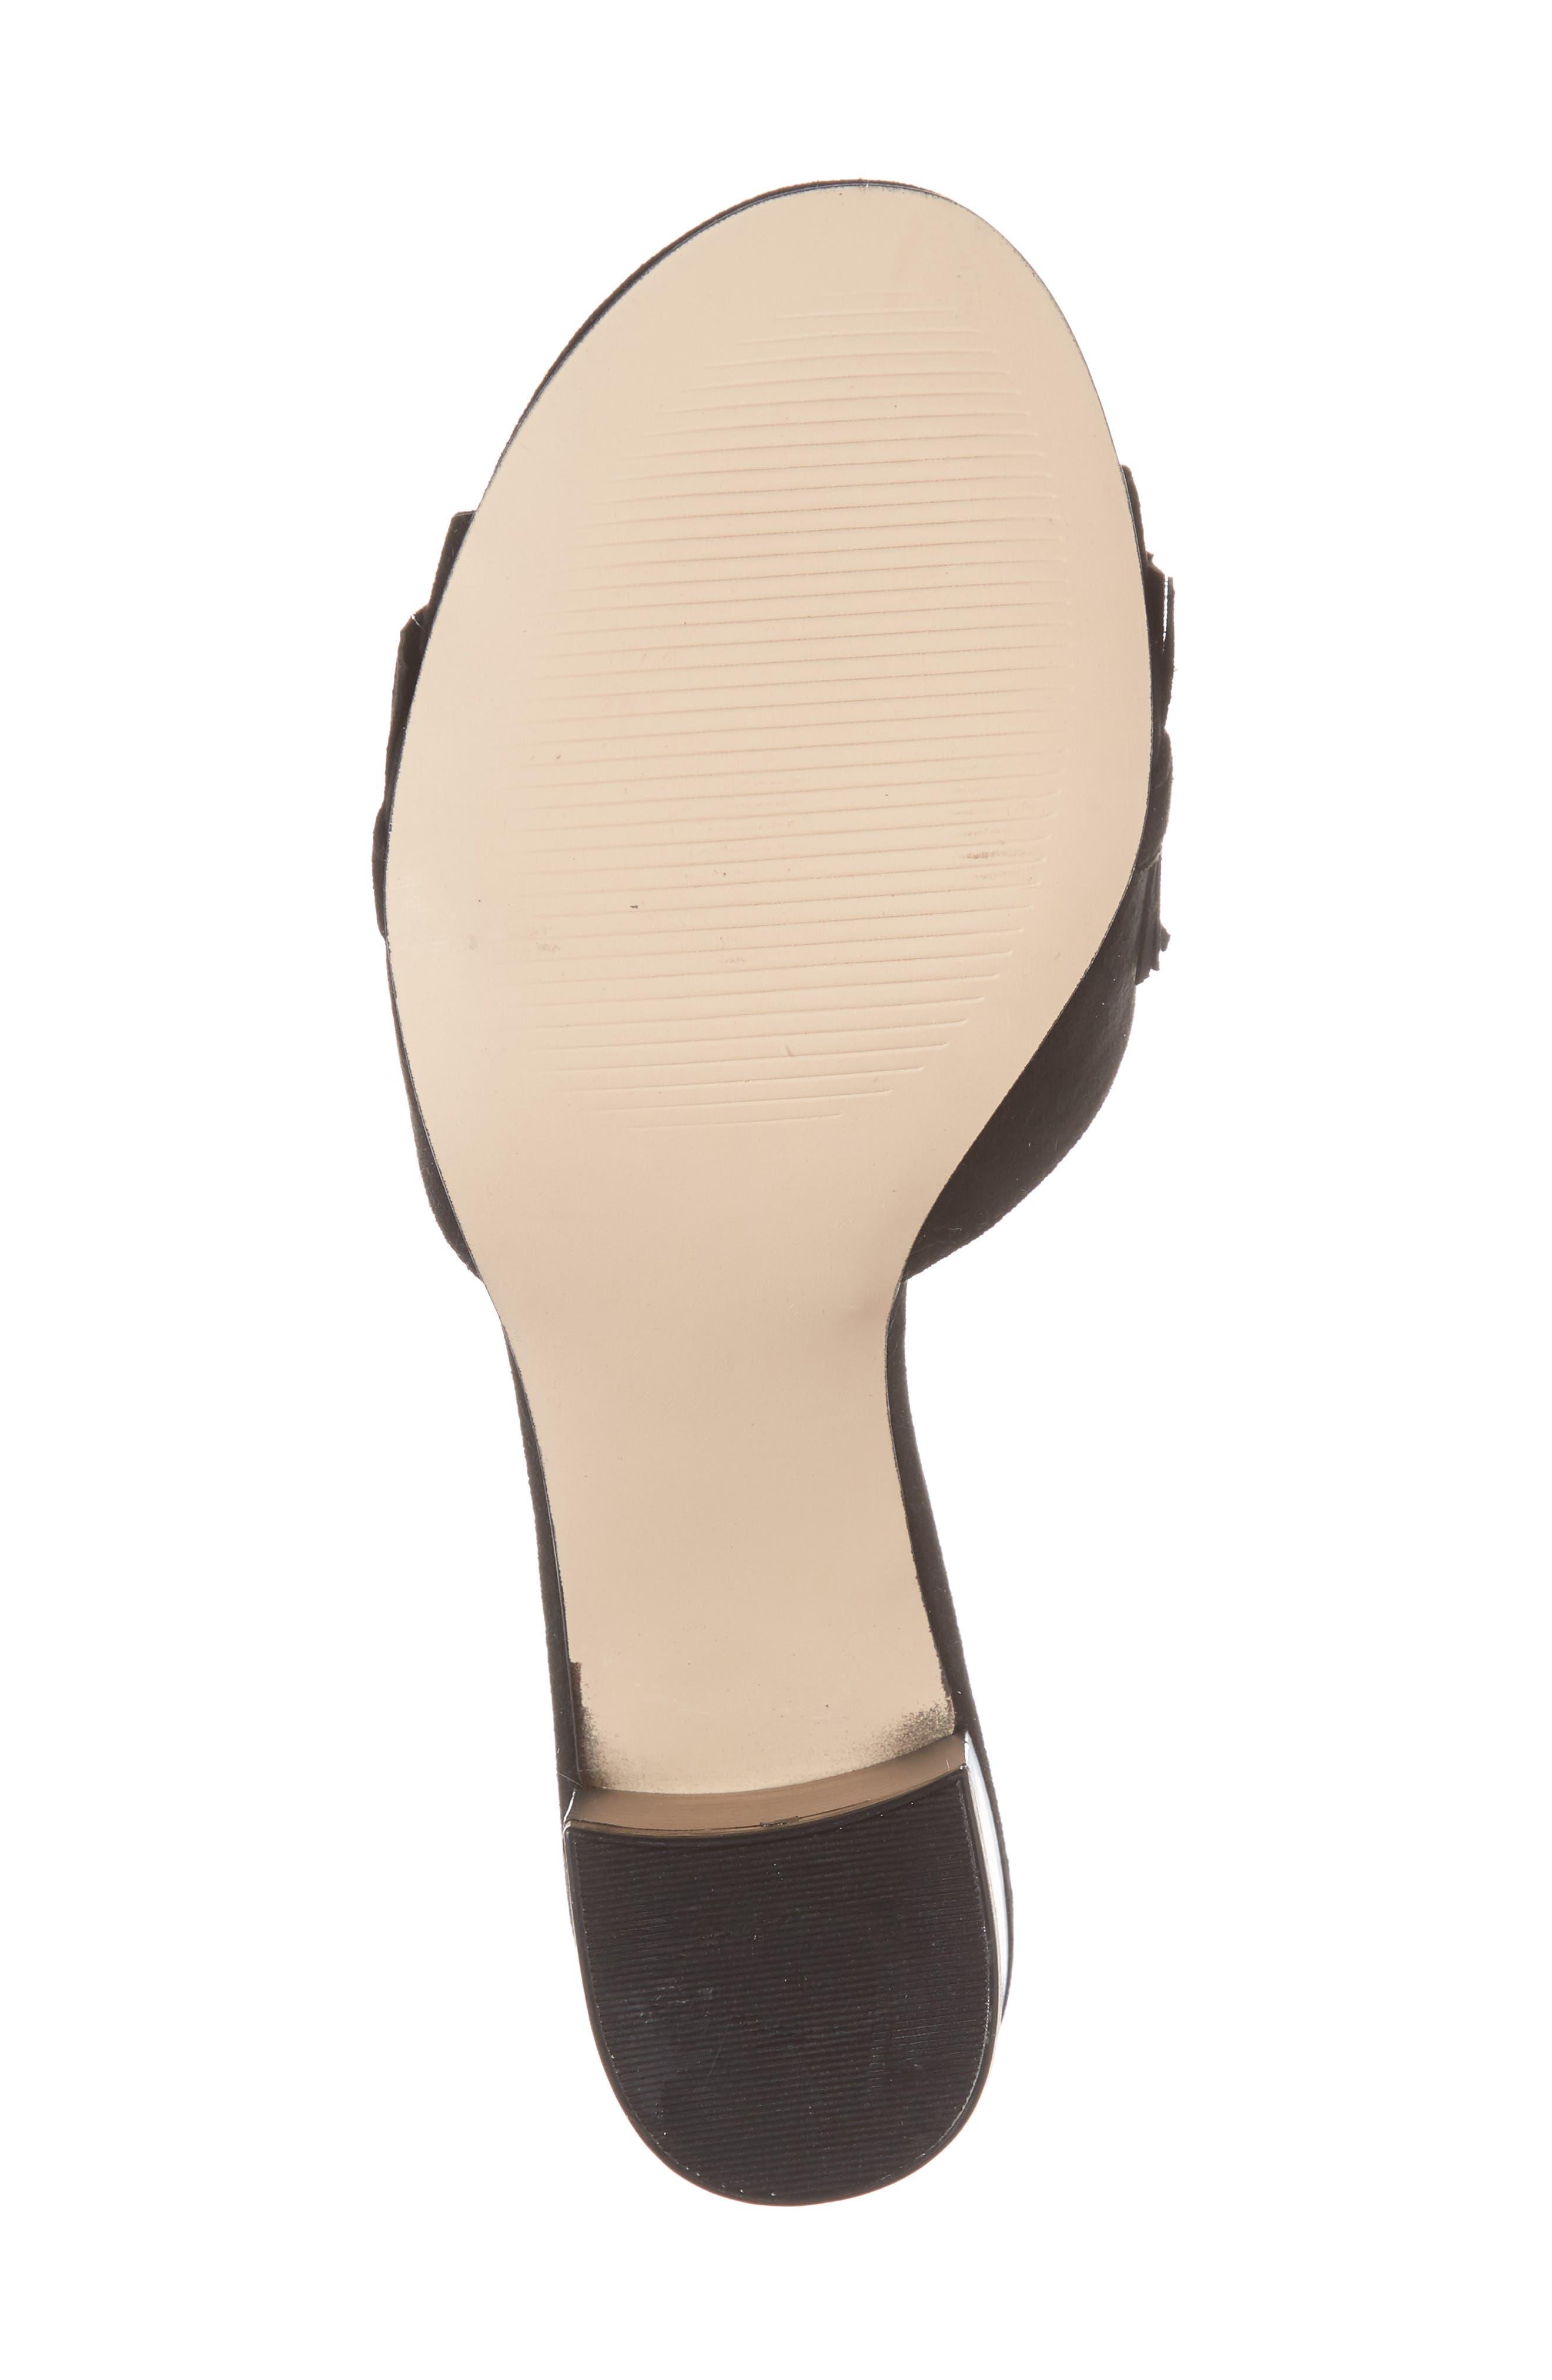 Zinnia Block Heel Slide Sandal,                             Alternate thumbnail 6, color,                             BLACK SUEDE